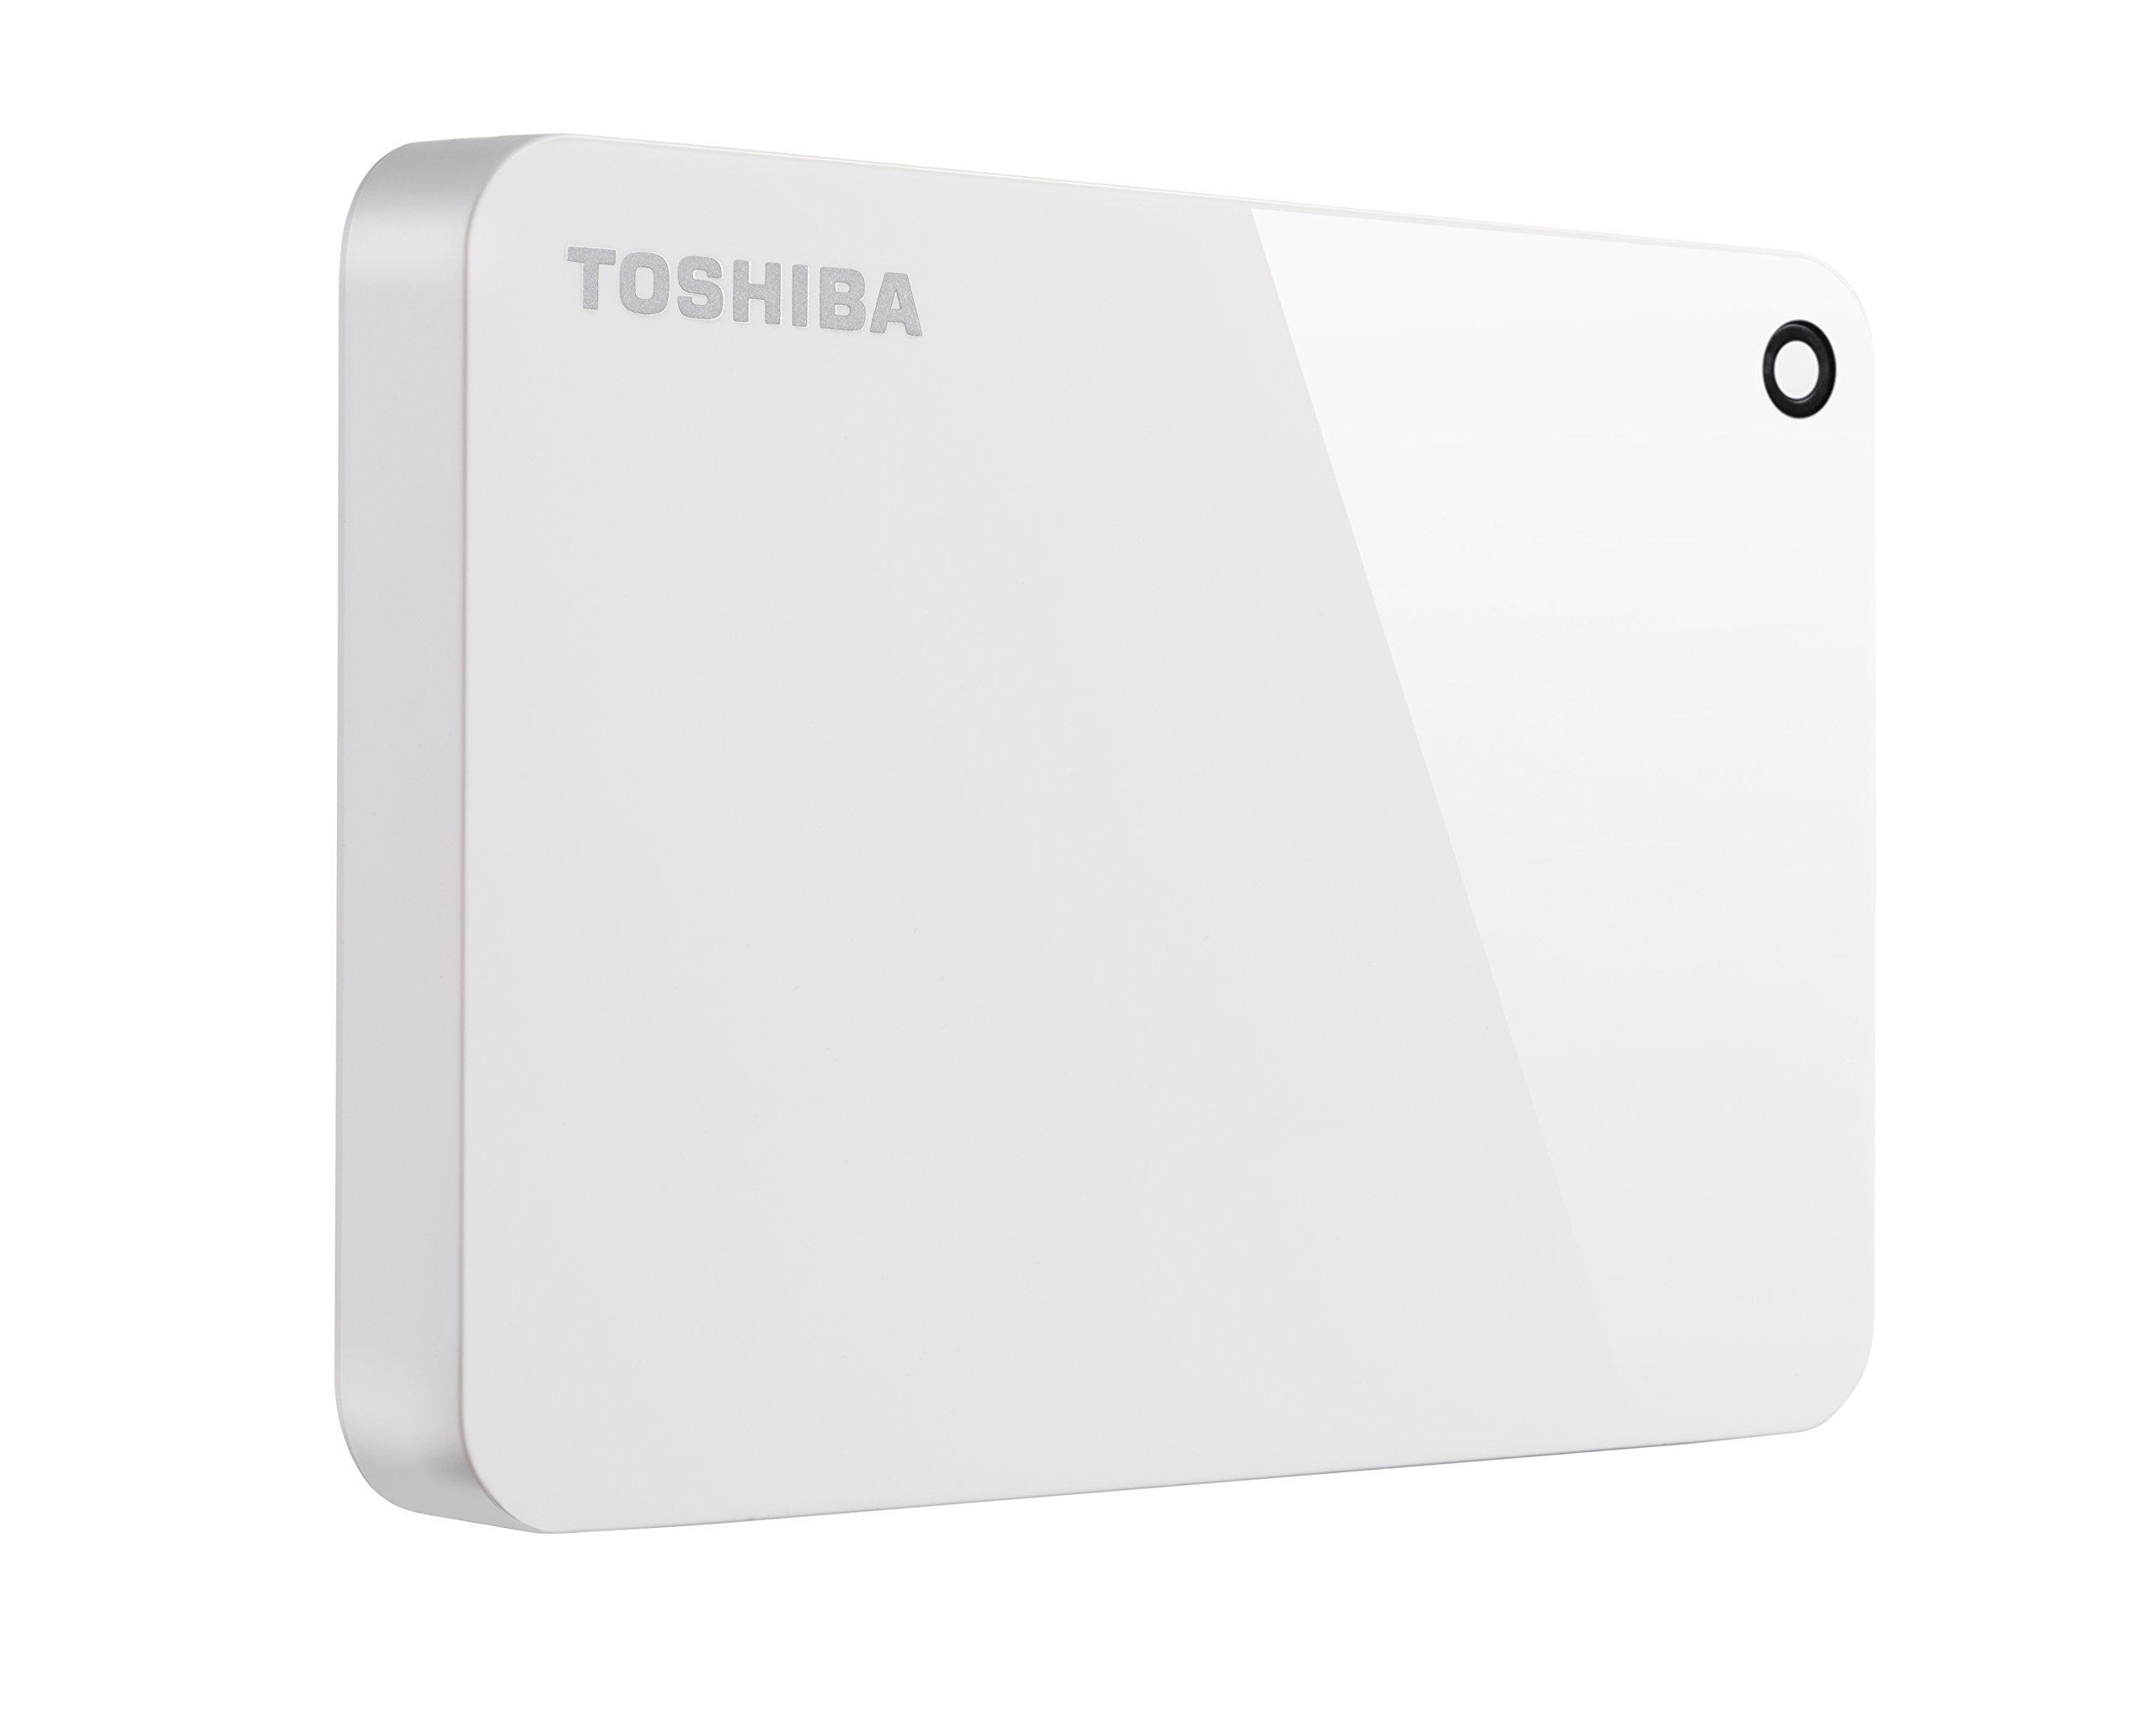 USB 3.0 PC SYNC Cable For Toshiba Canvio Slim Portable HDTD105XS3D1 HDTD105XK3D1